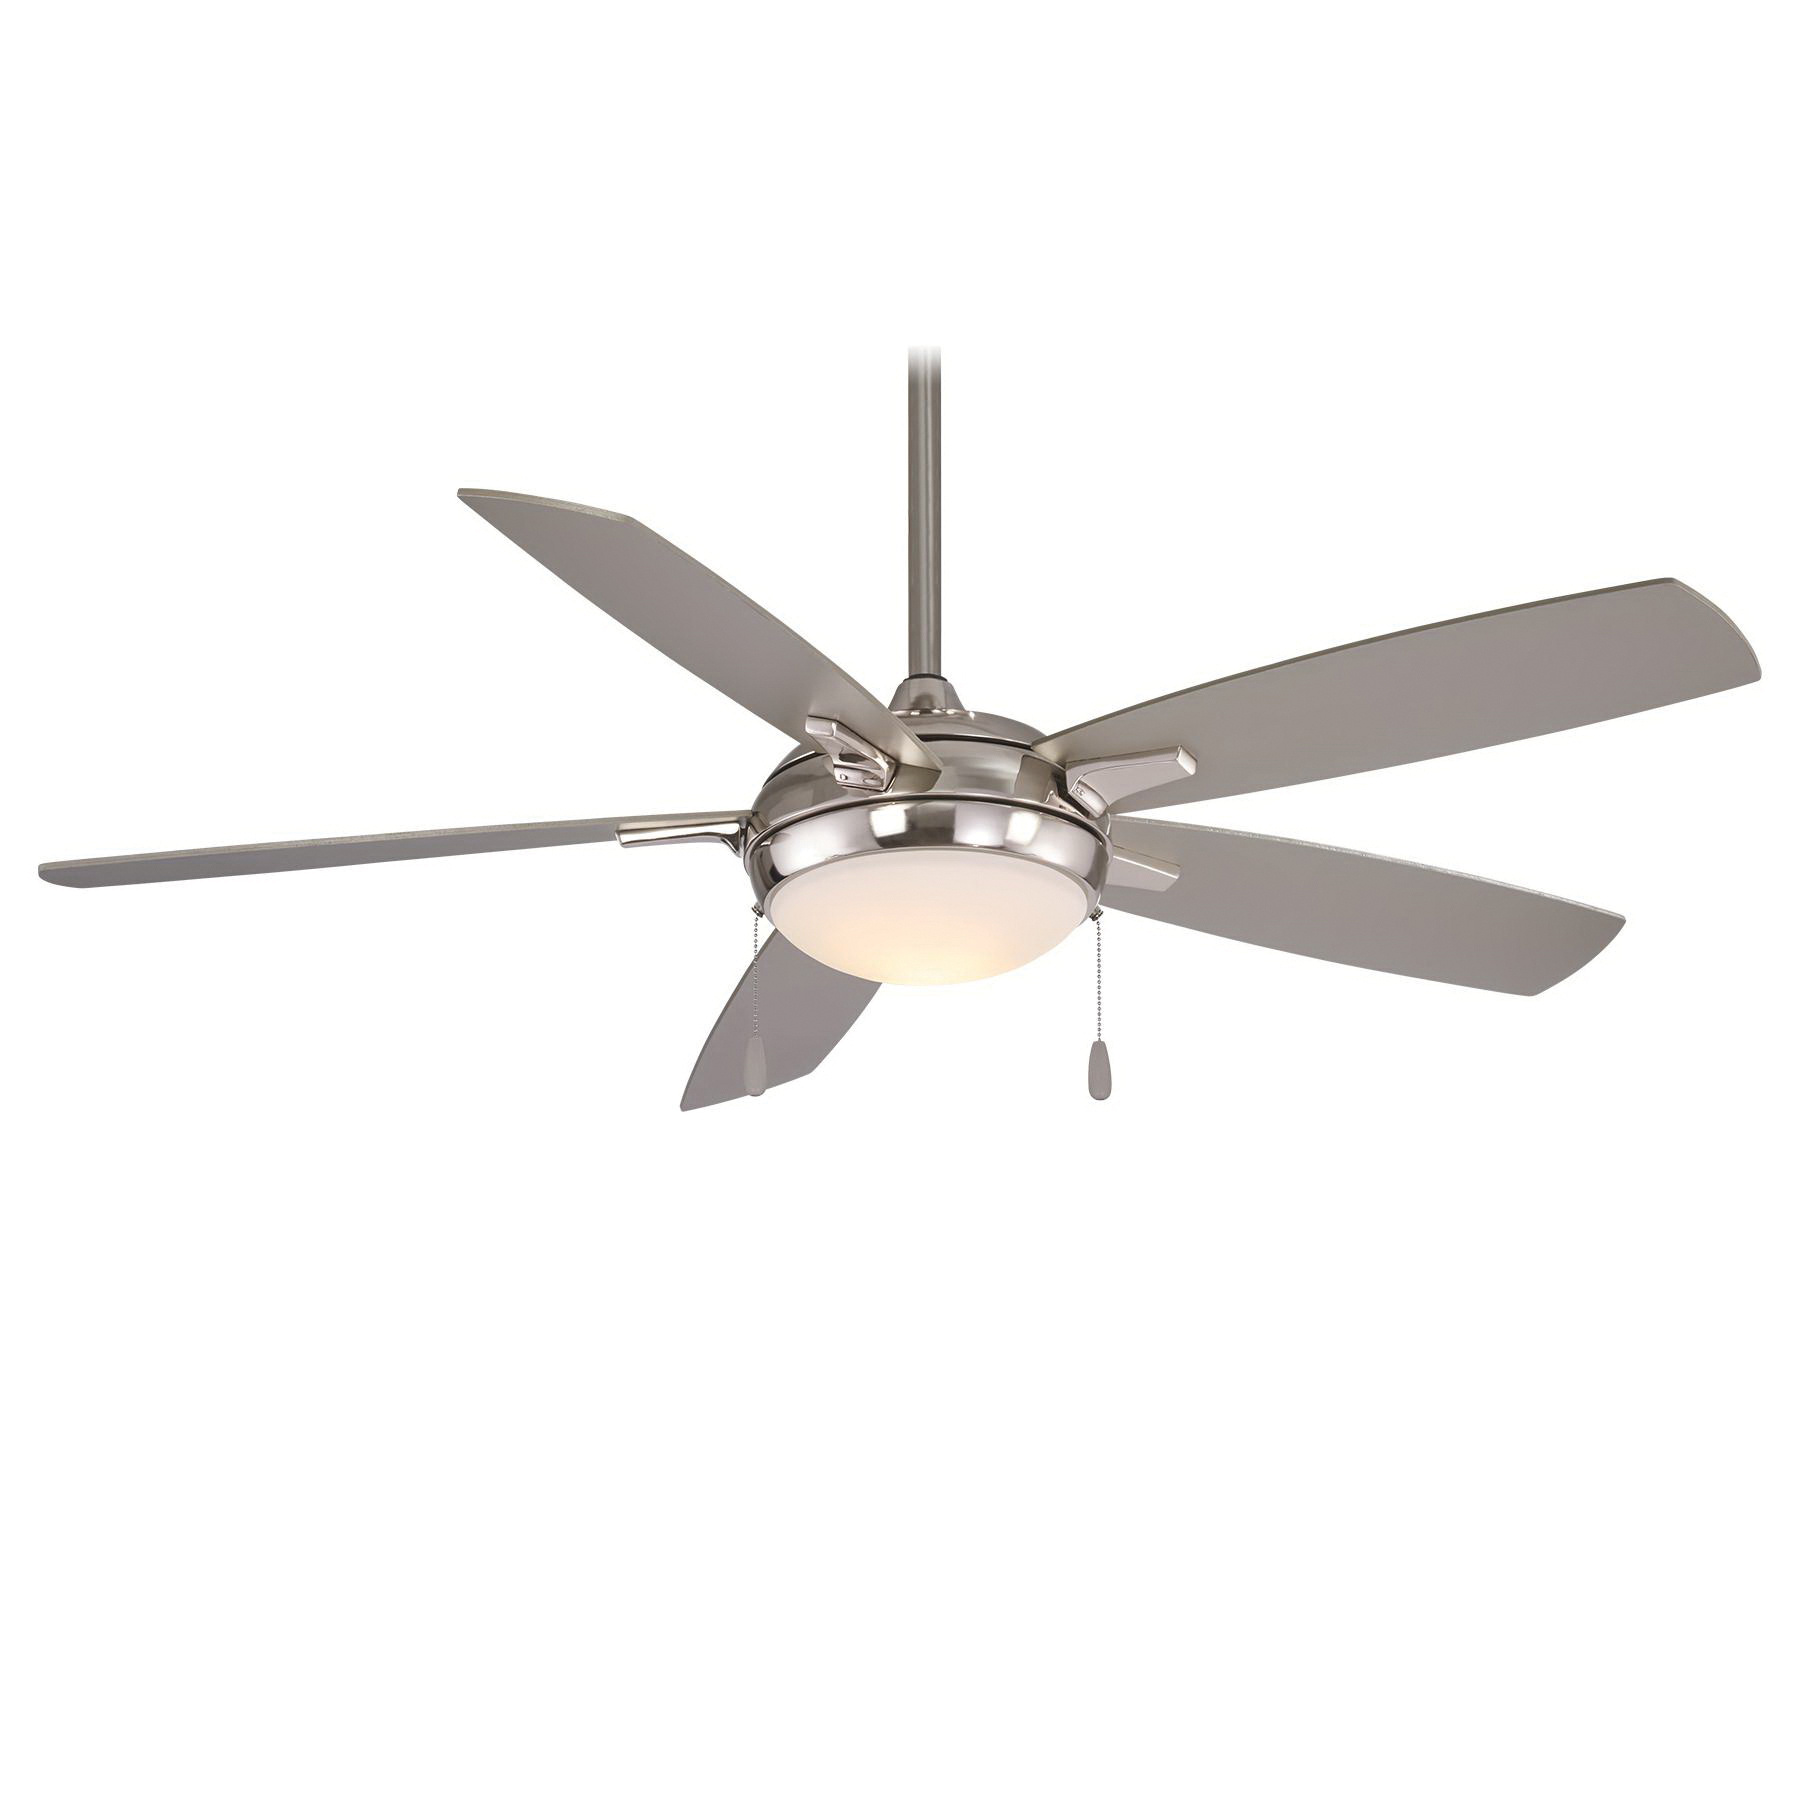 Hampton Bay Air Circulator : Minka aire f l bn ceiling fan with light inch blade